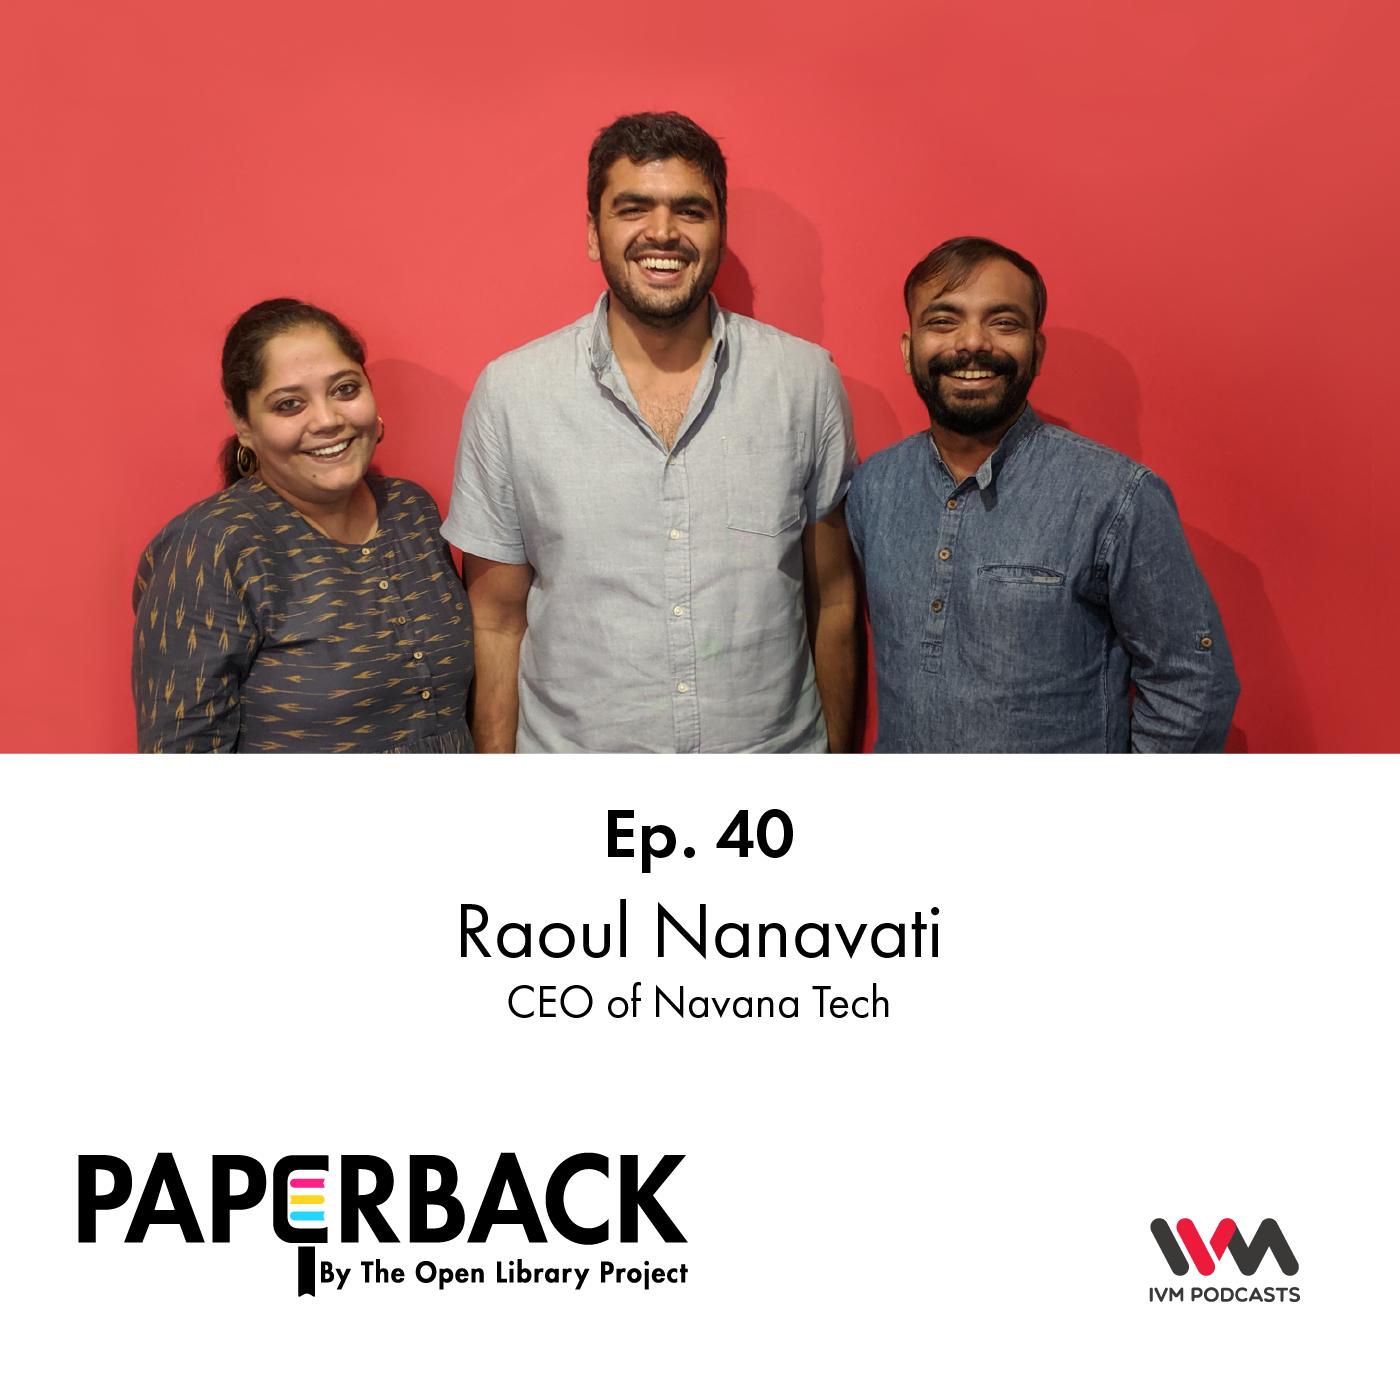 Ep. 40: Raoul Nanavati